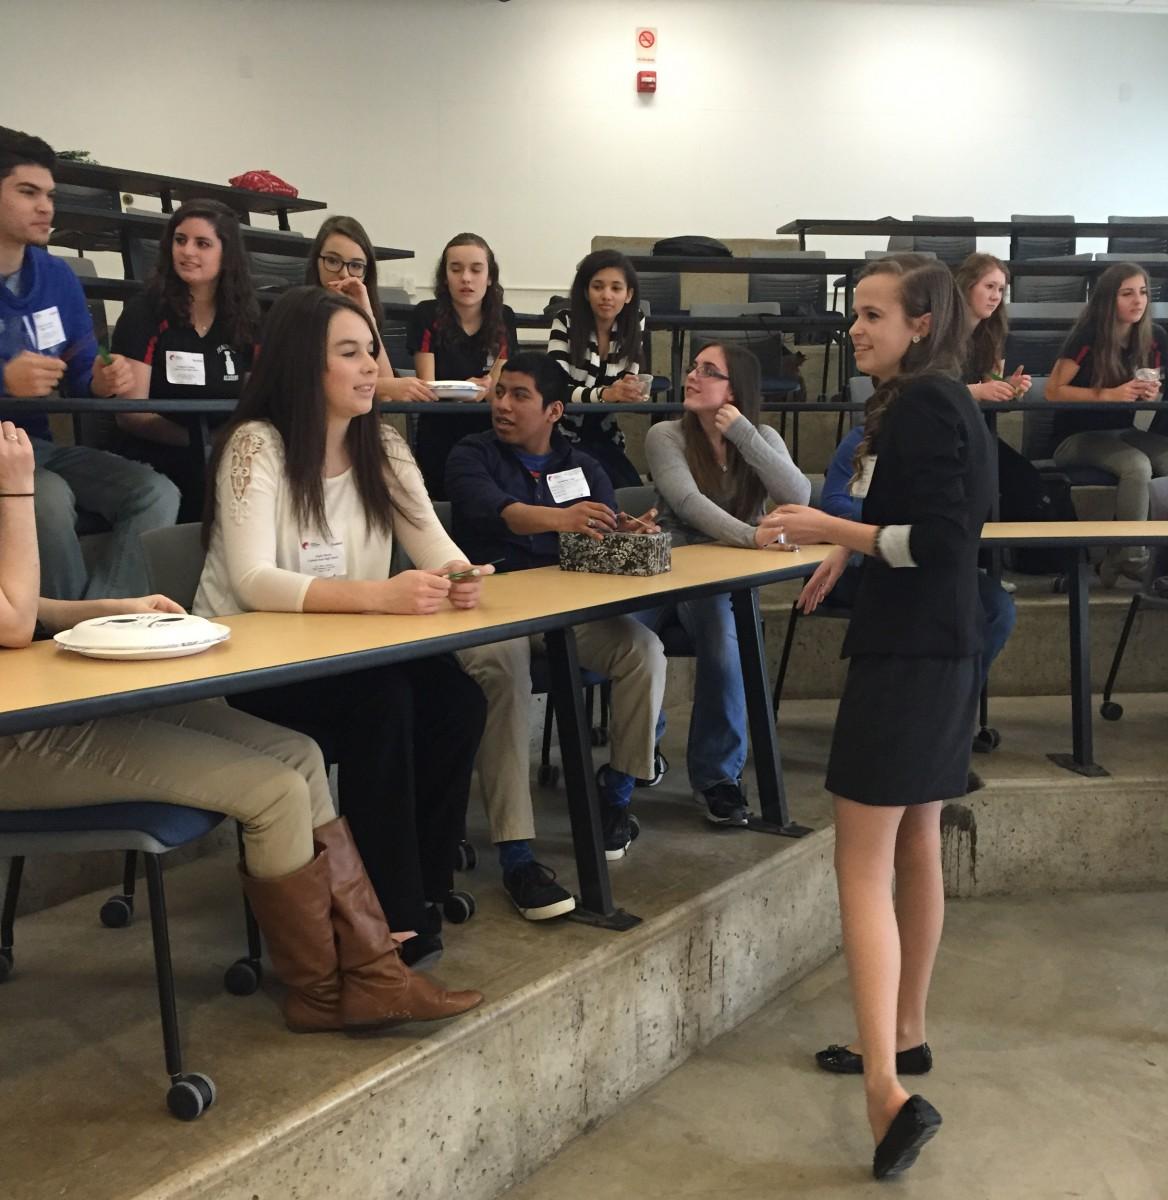 Milford students meeting